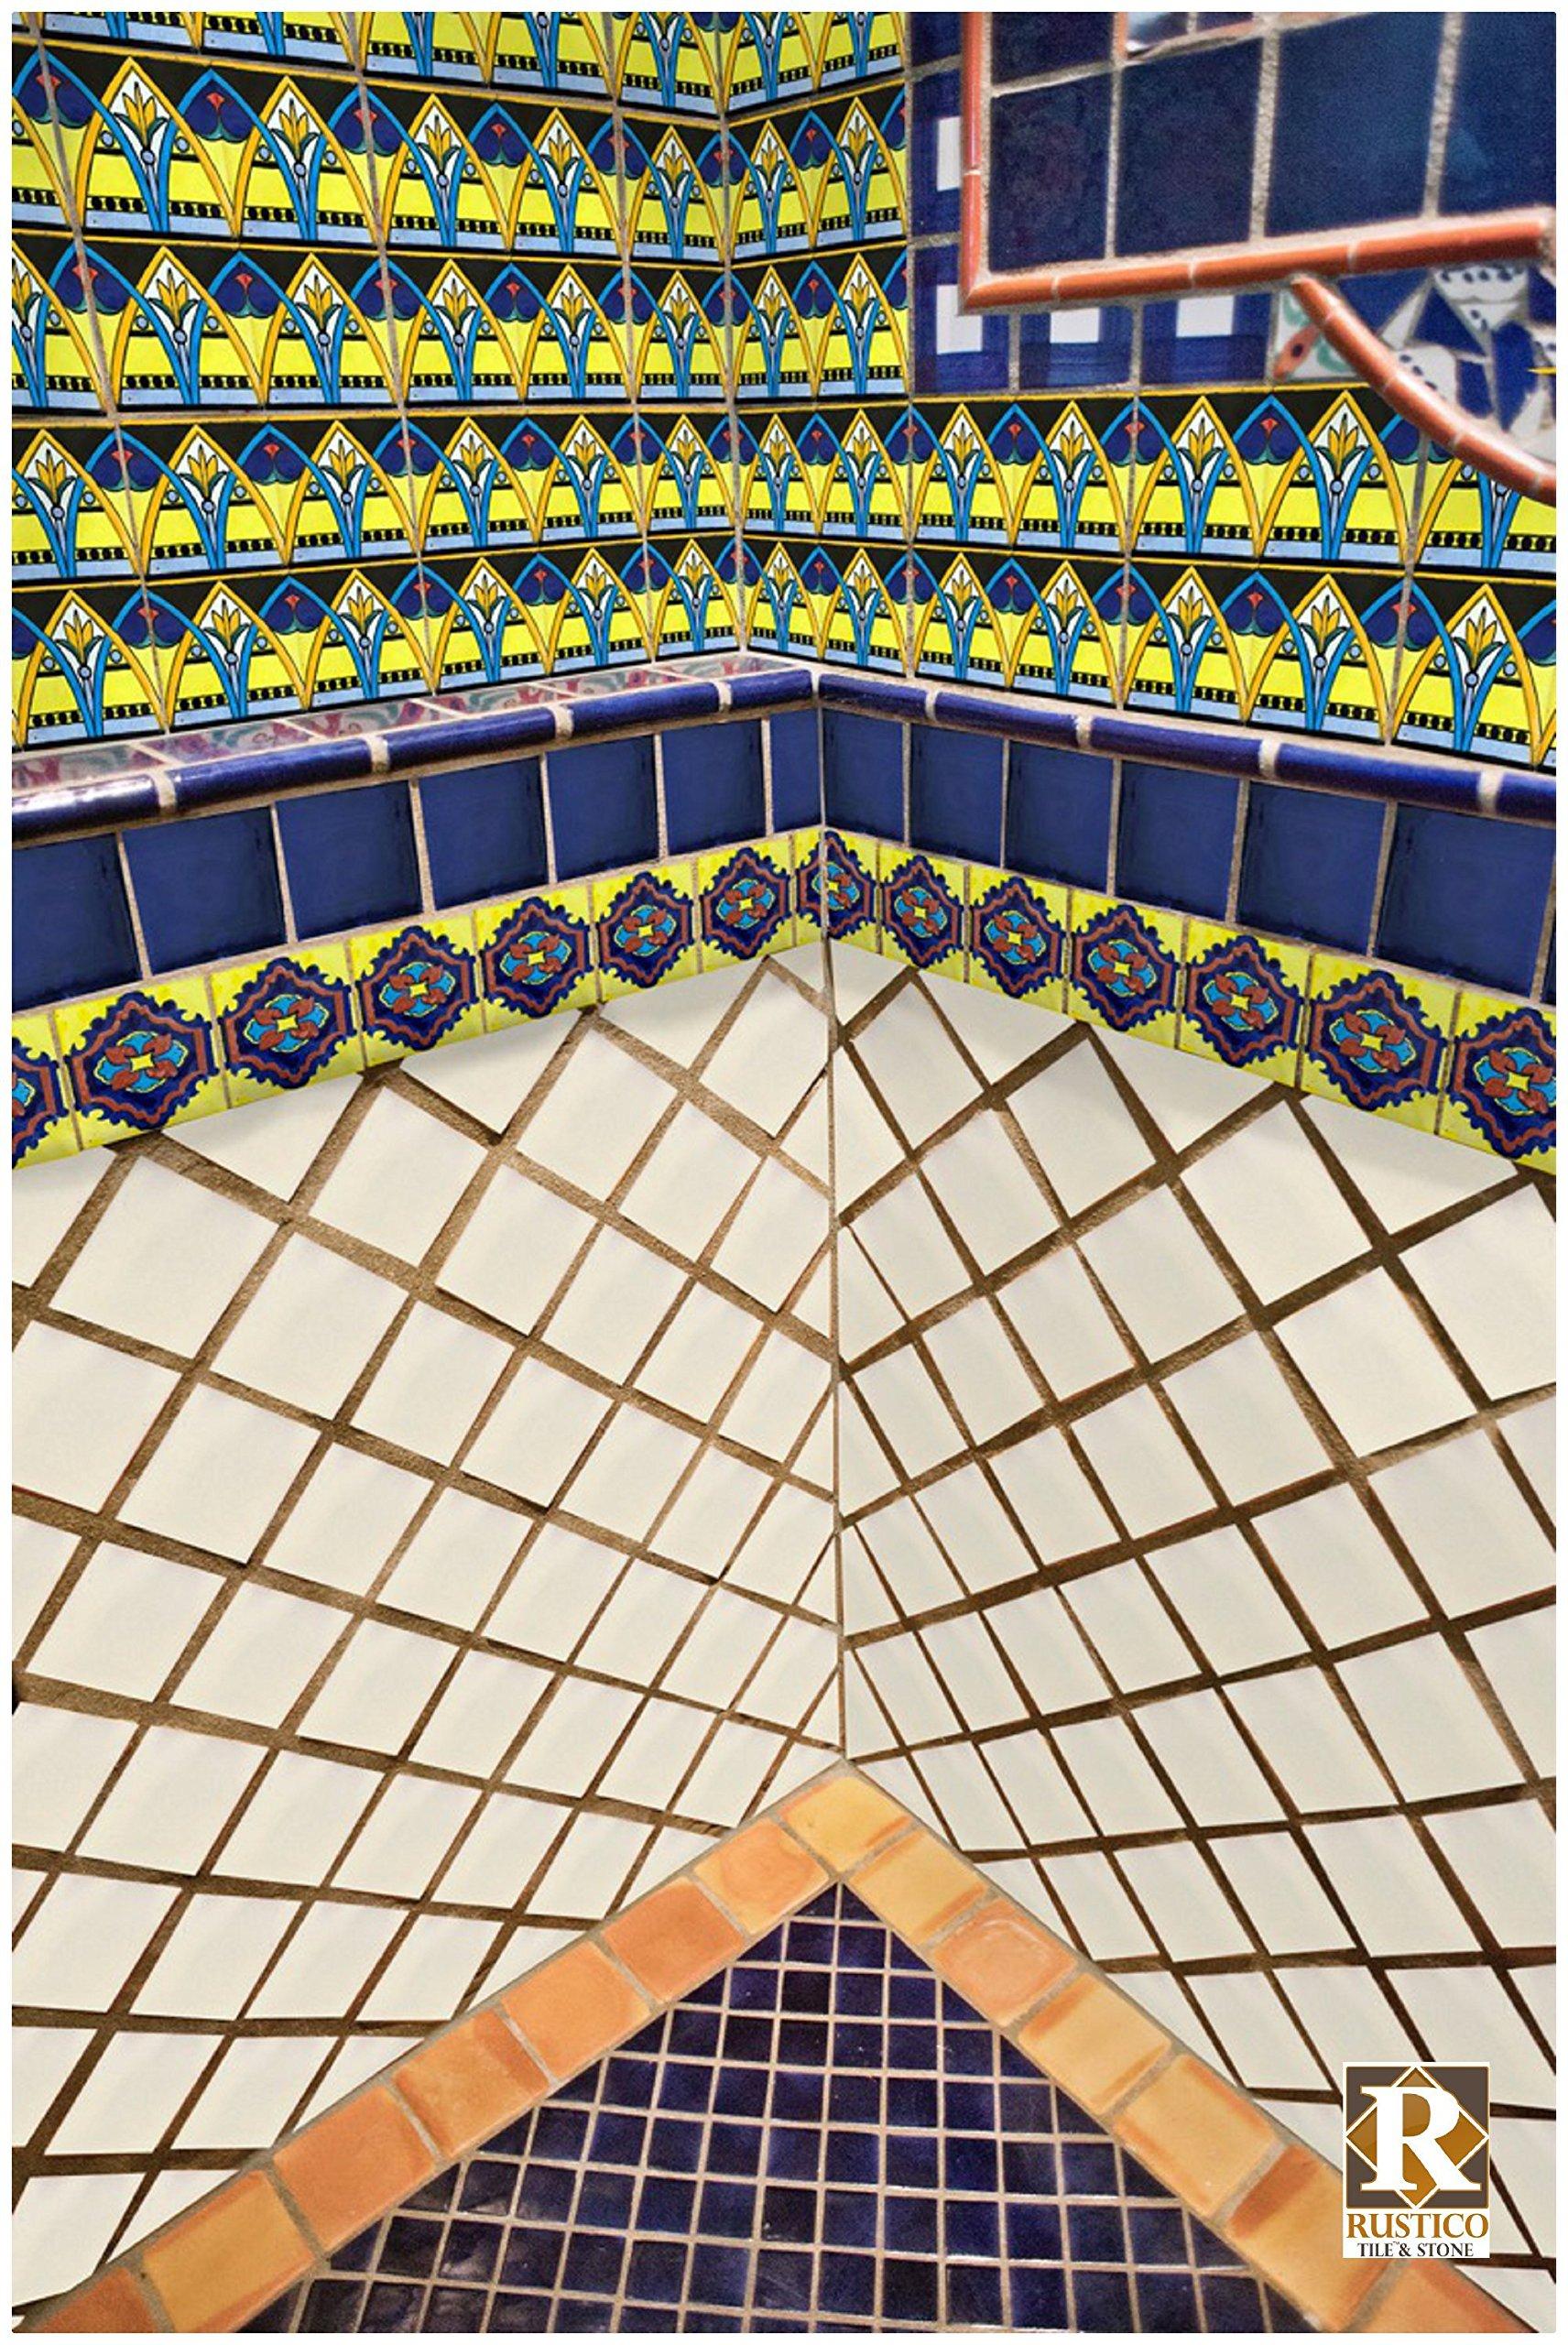 Rustico Tile and Stone TR4COBALT Cobalt Blue Painted Tile Box of 90 4 x 4'', Navy by Rustico Tile and Stone (Image #2)